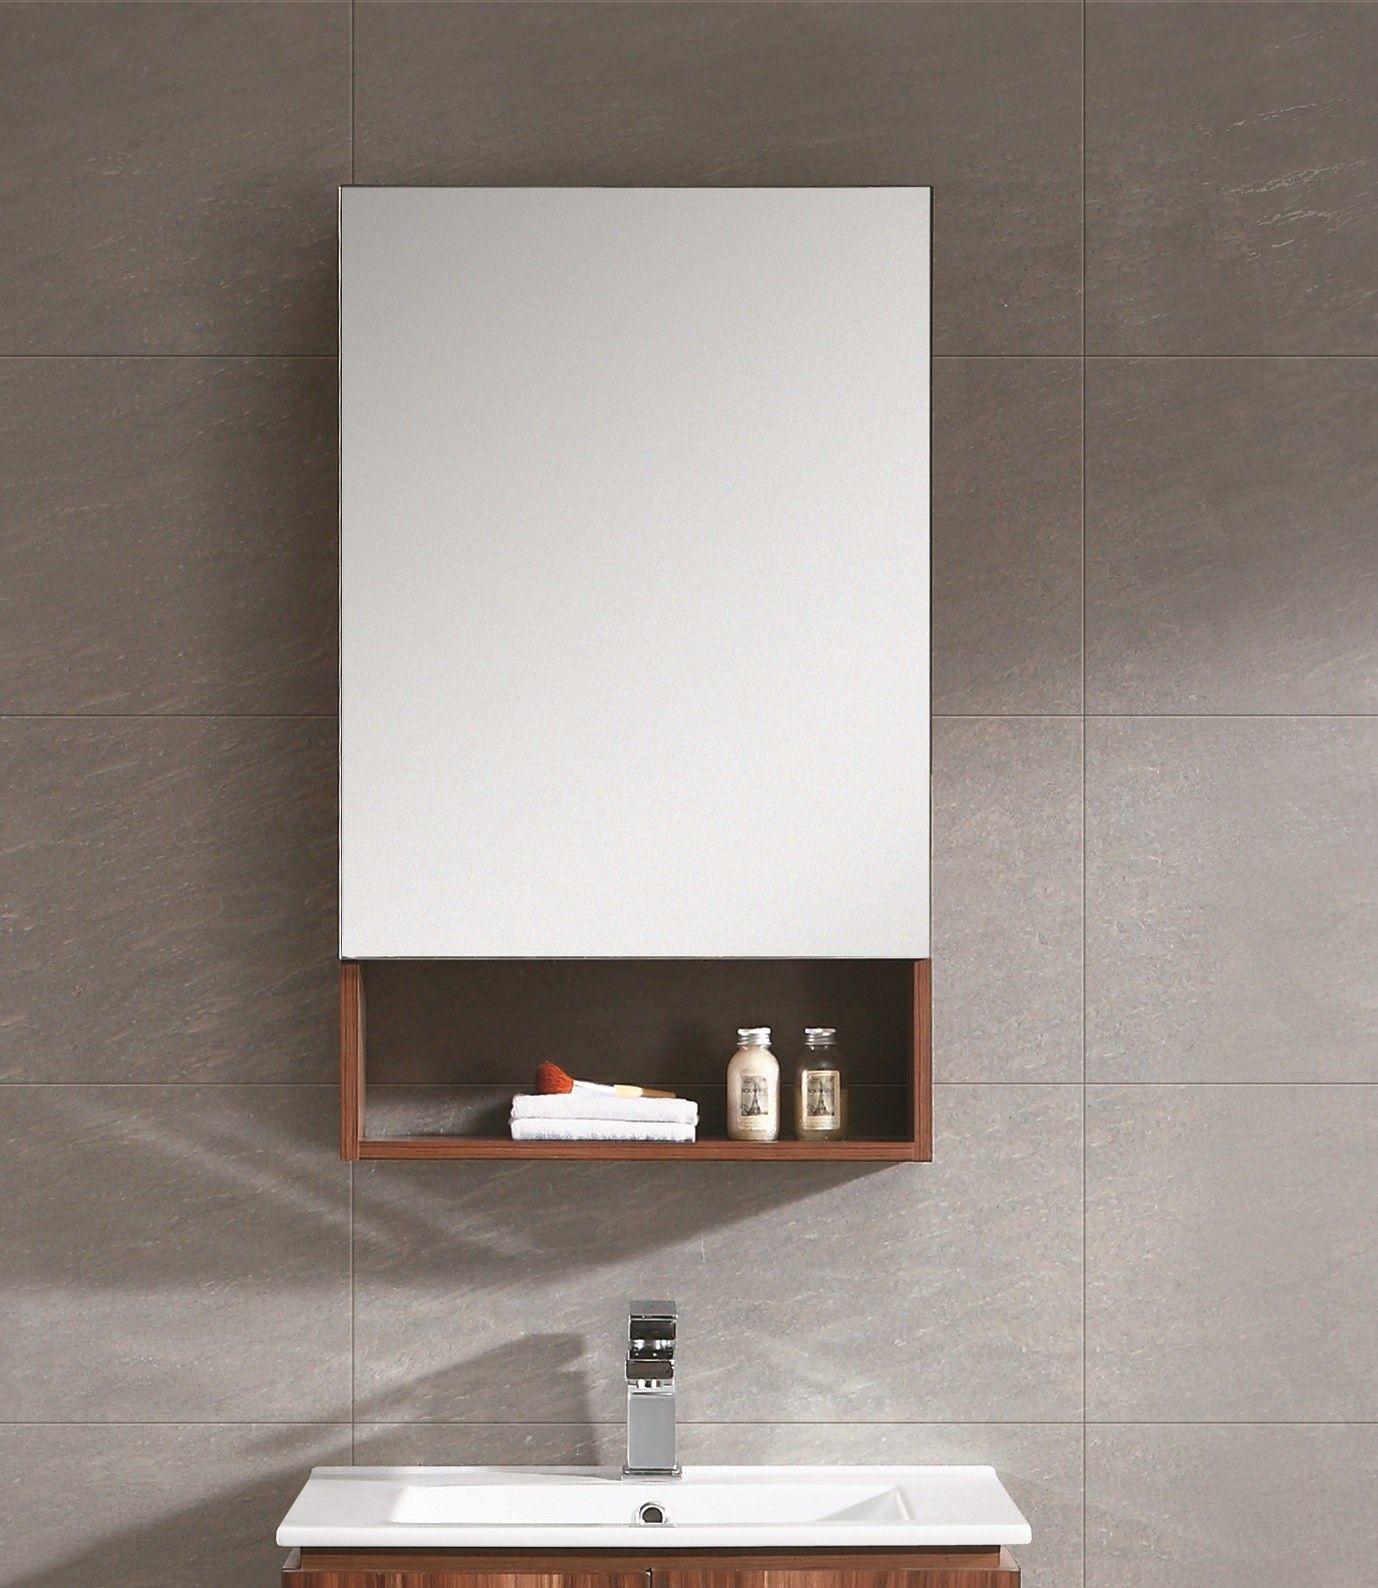 Glenwood 31 5 X 20 Surface Mount Medicine Cabinet Modern Master Bathroom Bathroom Mirror With Shelf Big Bathrooms